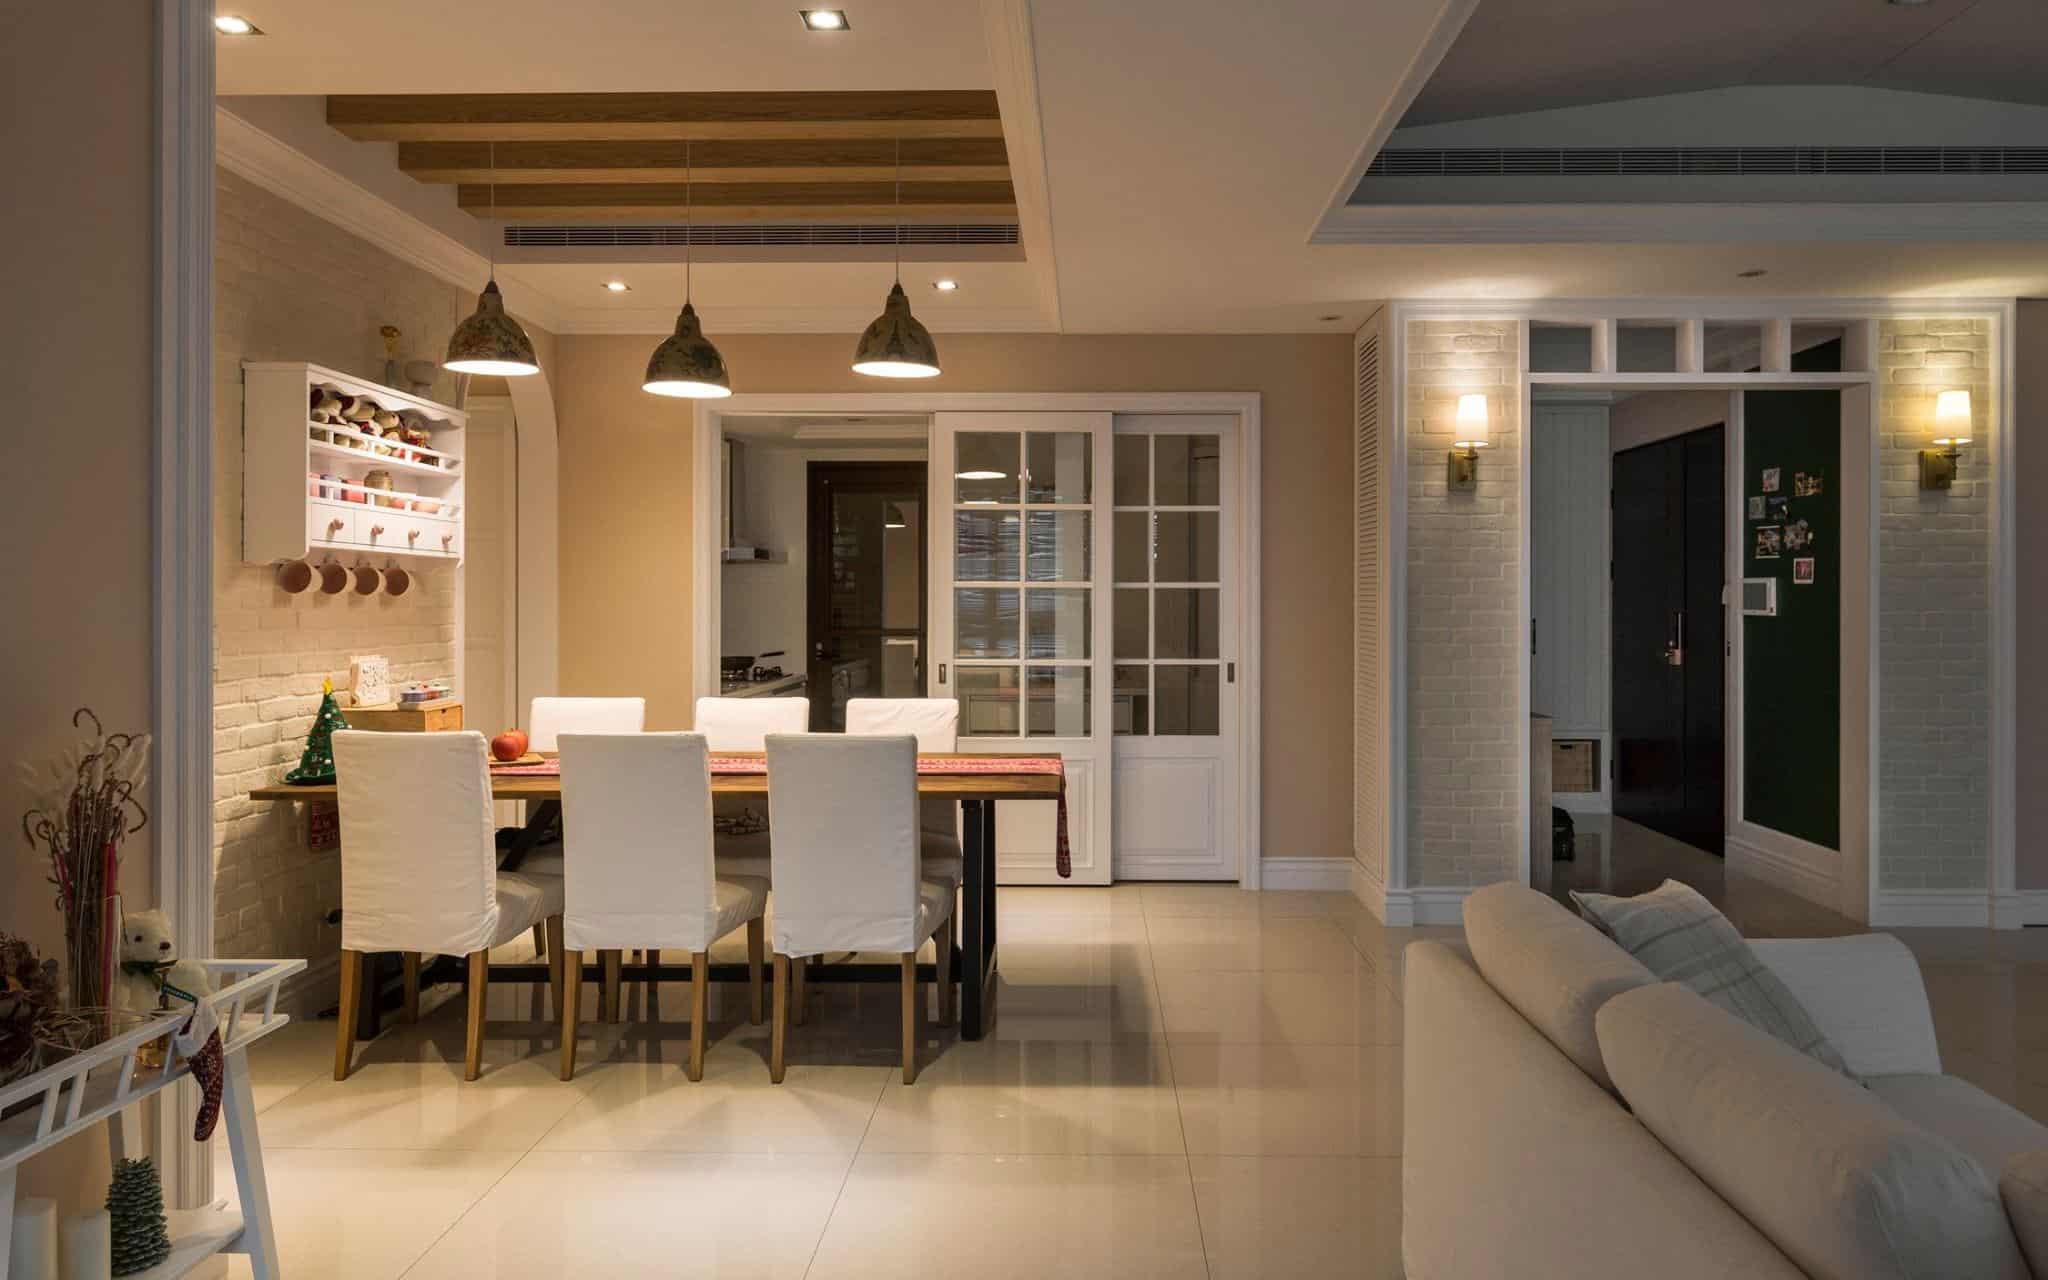 thiet-ke-noi-that-chung-cu-cau-dien-6 Thiết kế nội thất chung cư Cầu Diễn - A. Khoa